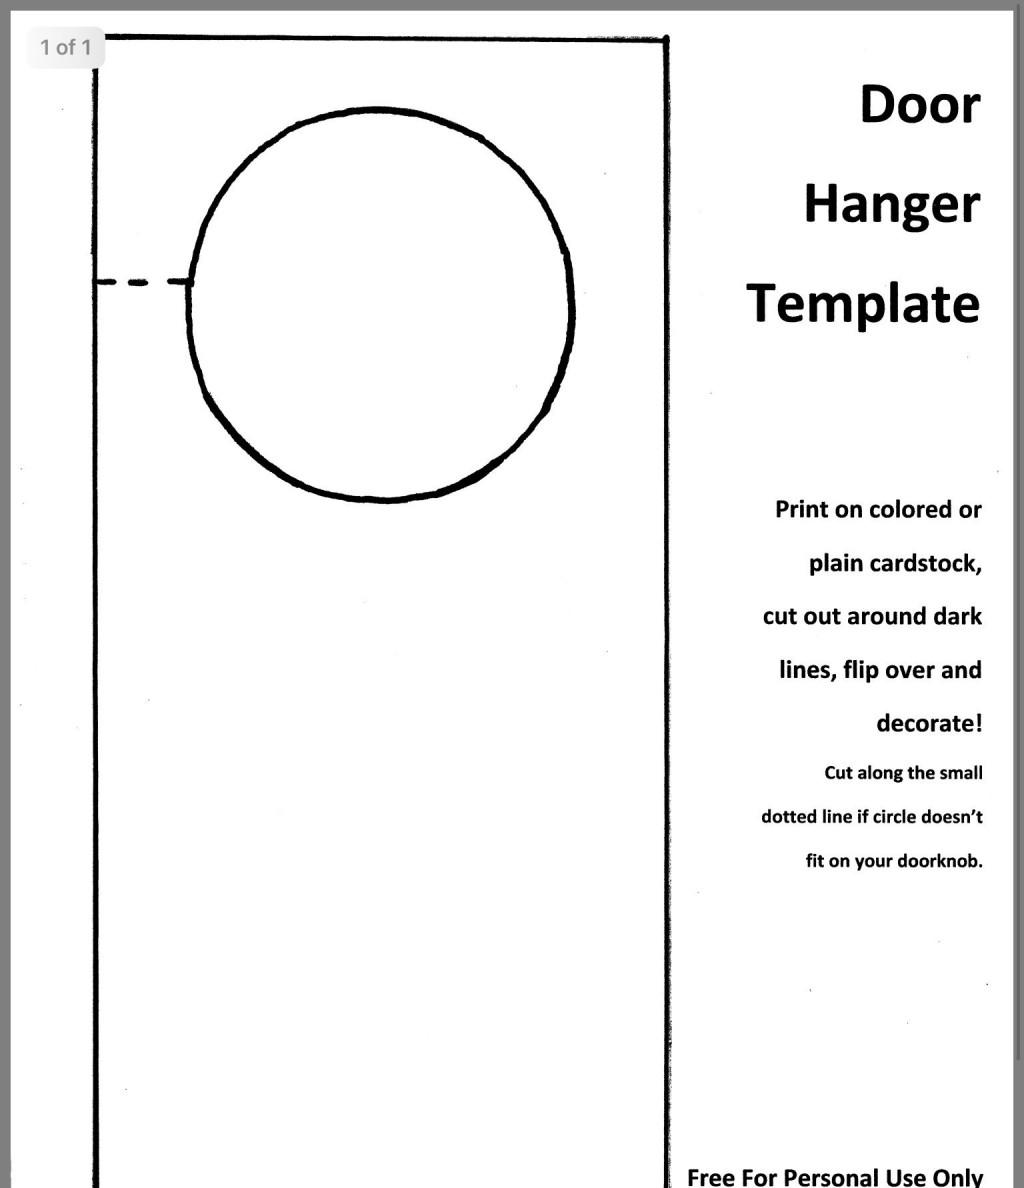 000 Wonderful Door Hanger Template For Word Photo  Free MicrosoftLarge